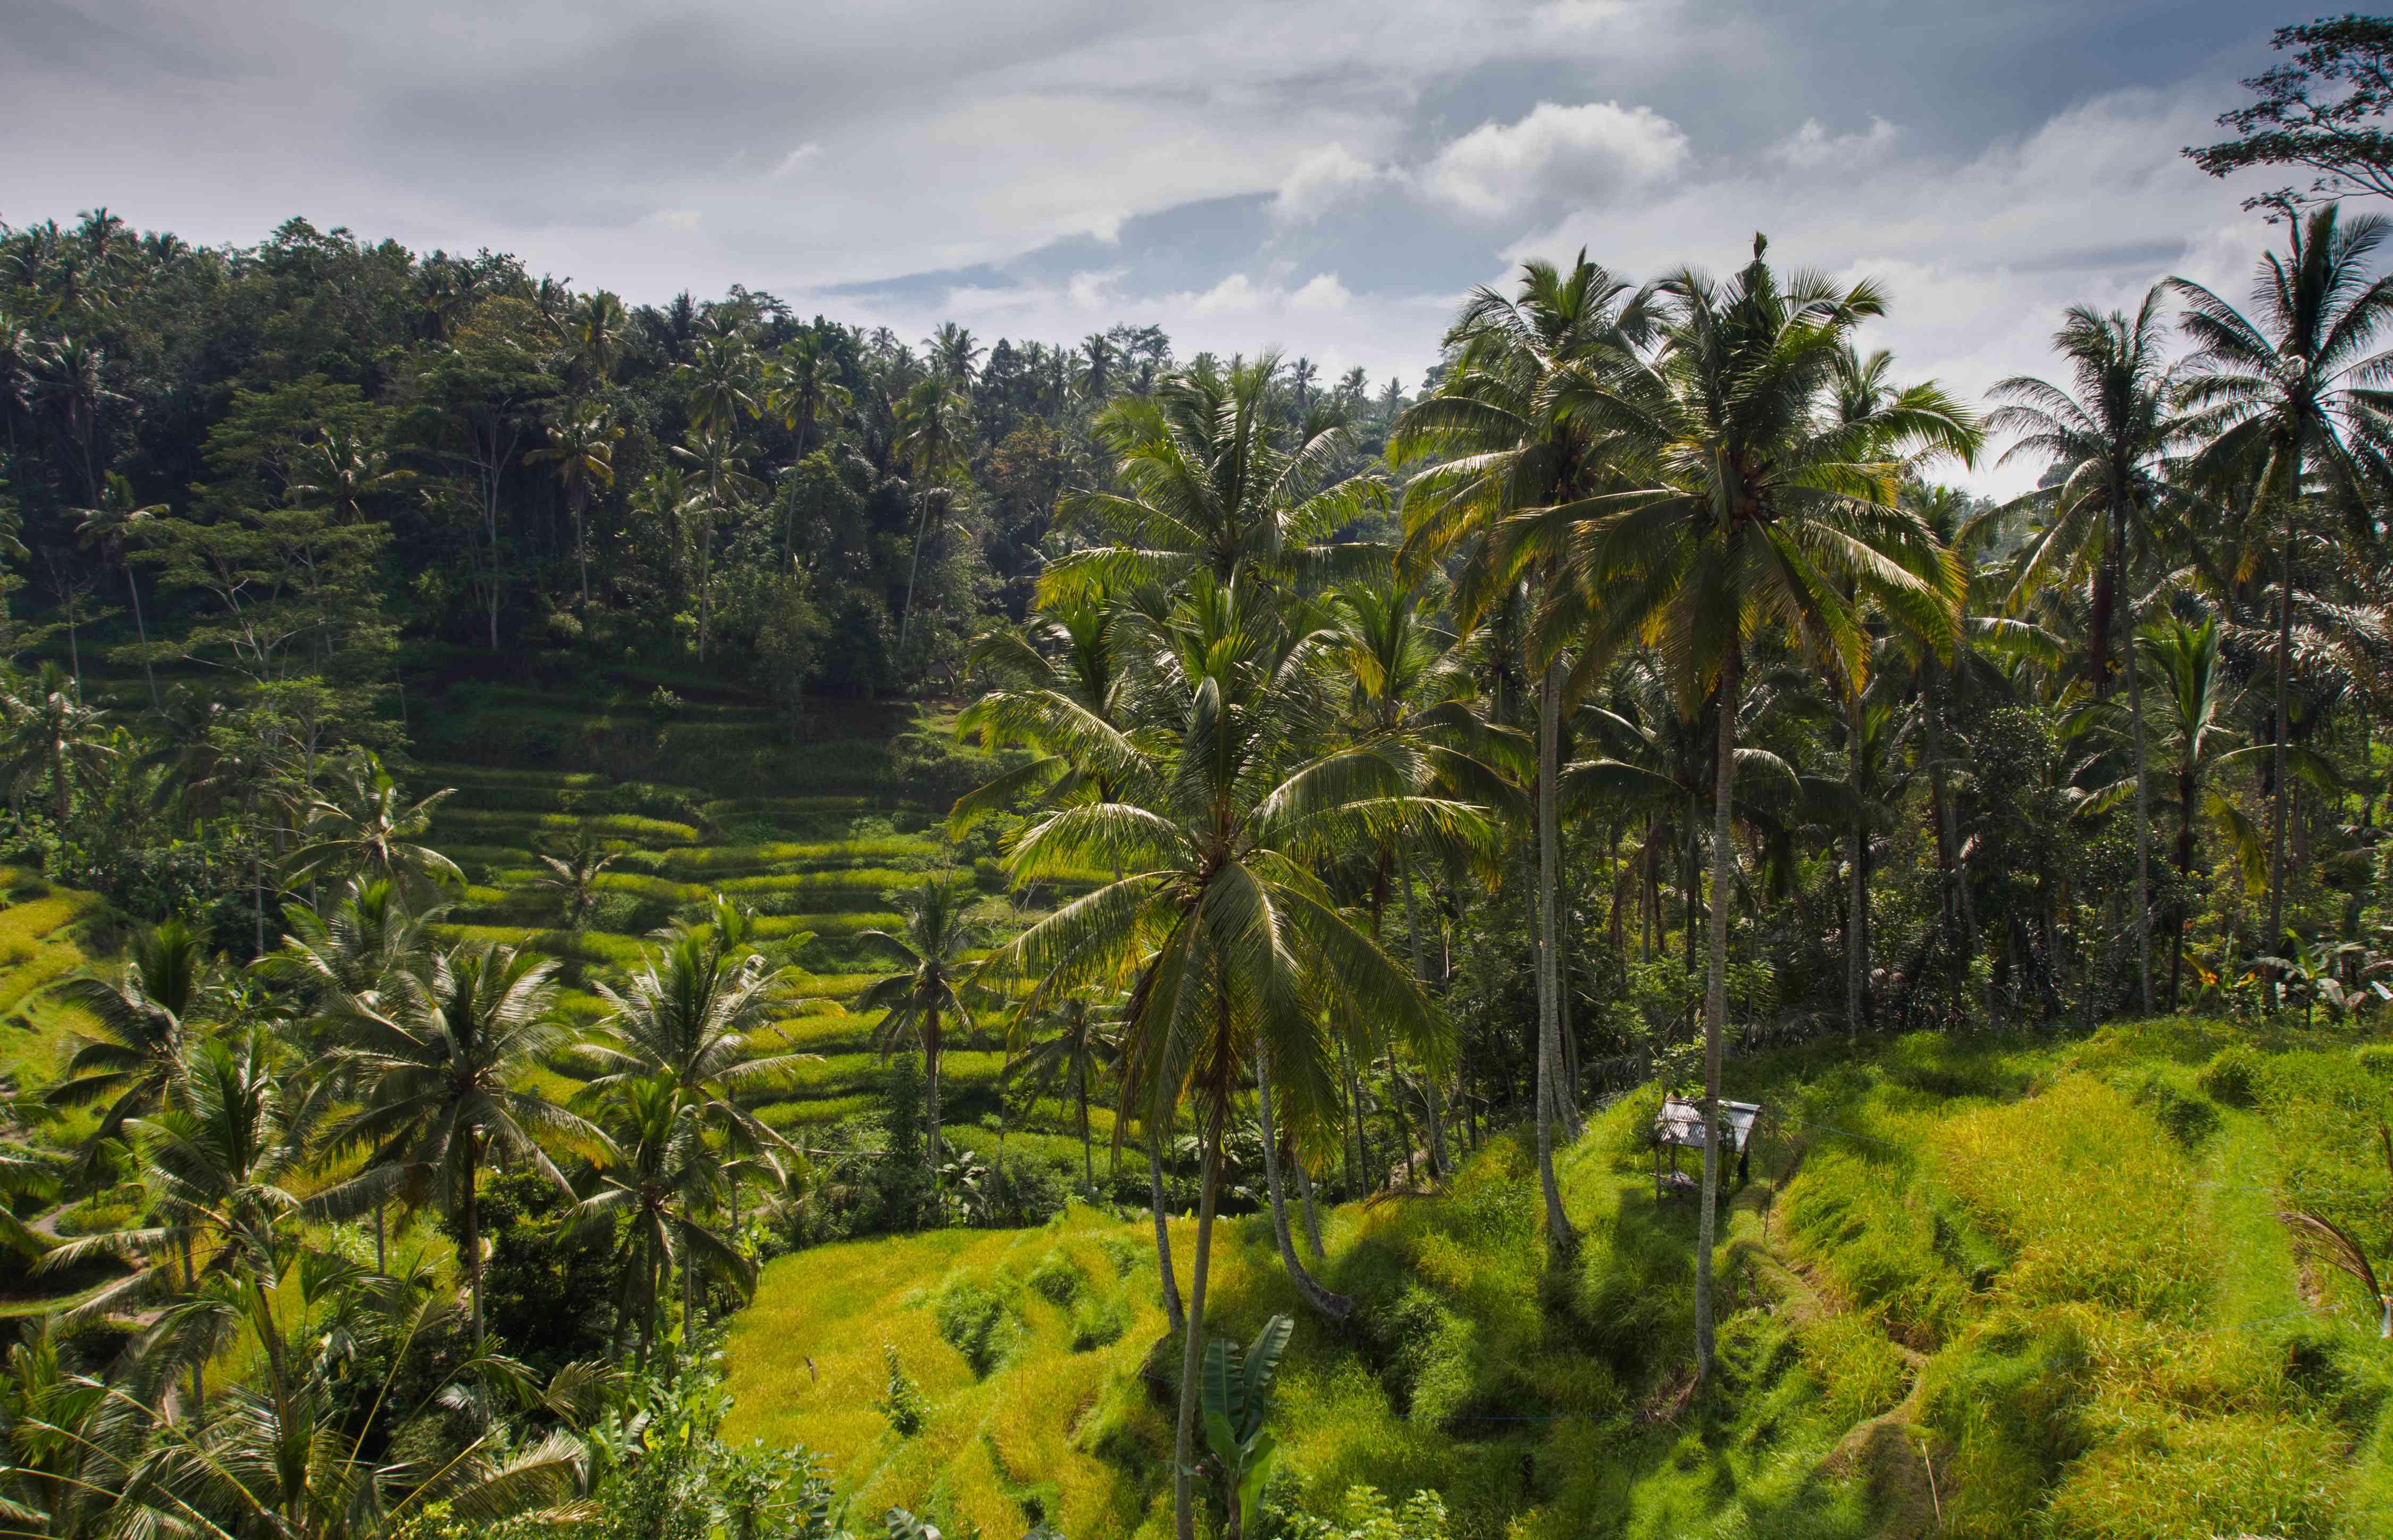 Tegalland rice terraces near Ubud, Bali